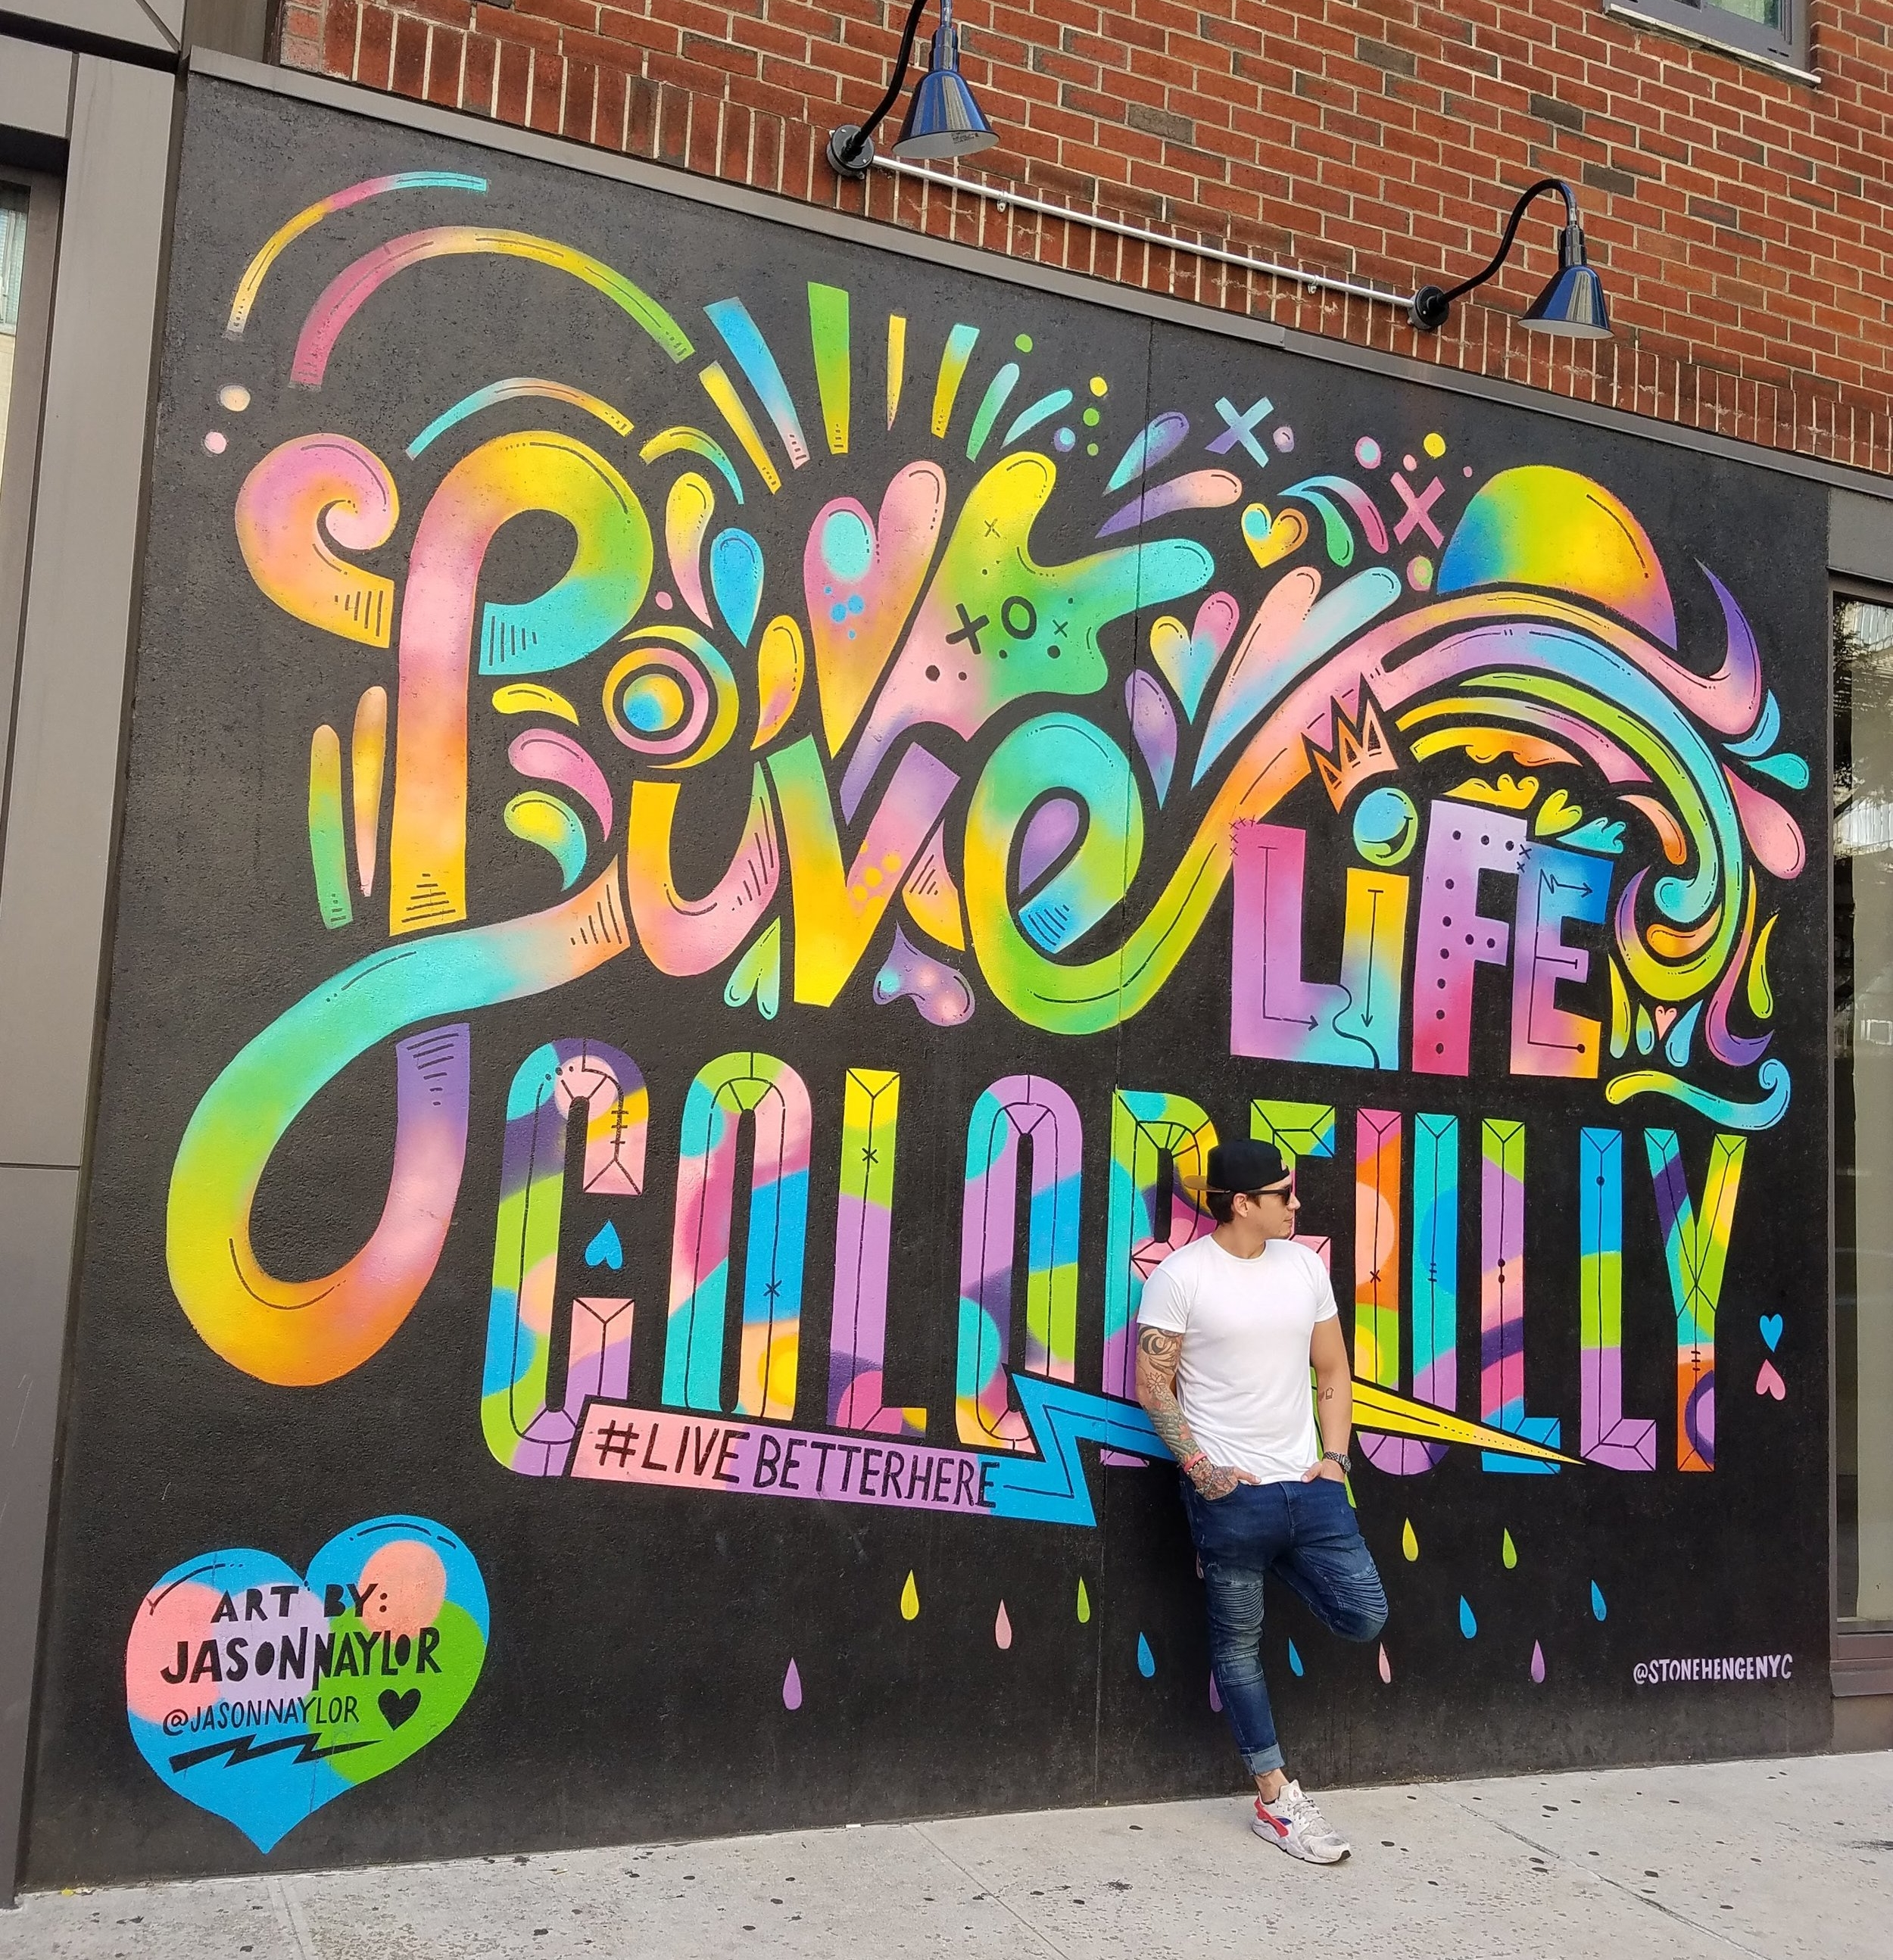 Mural in Greenwich Village, New York.